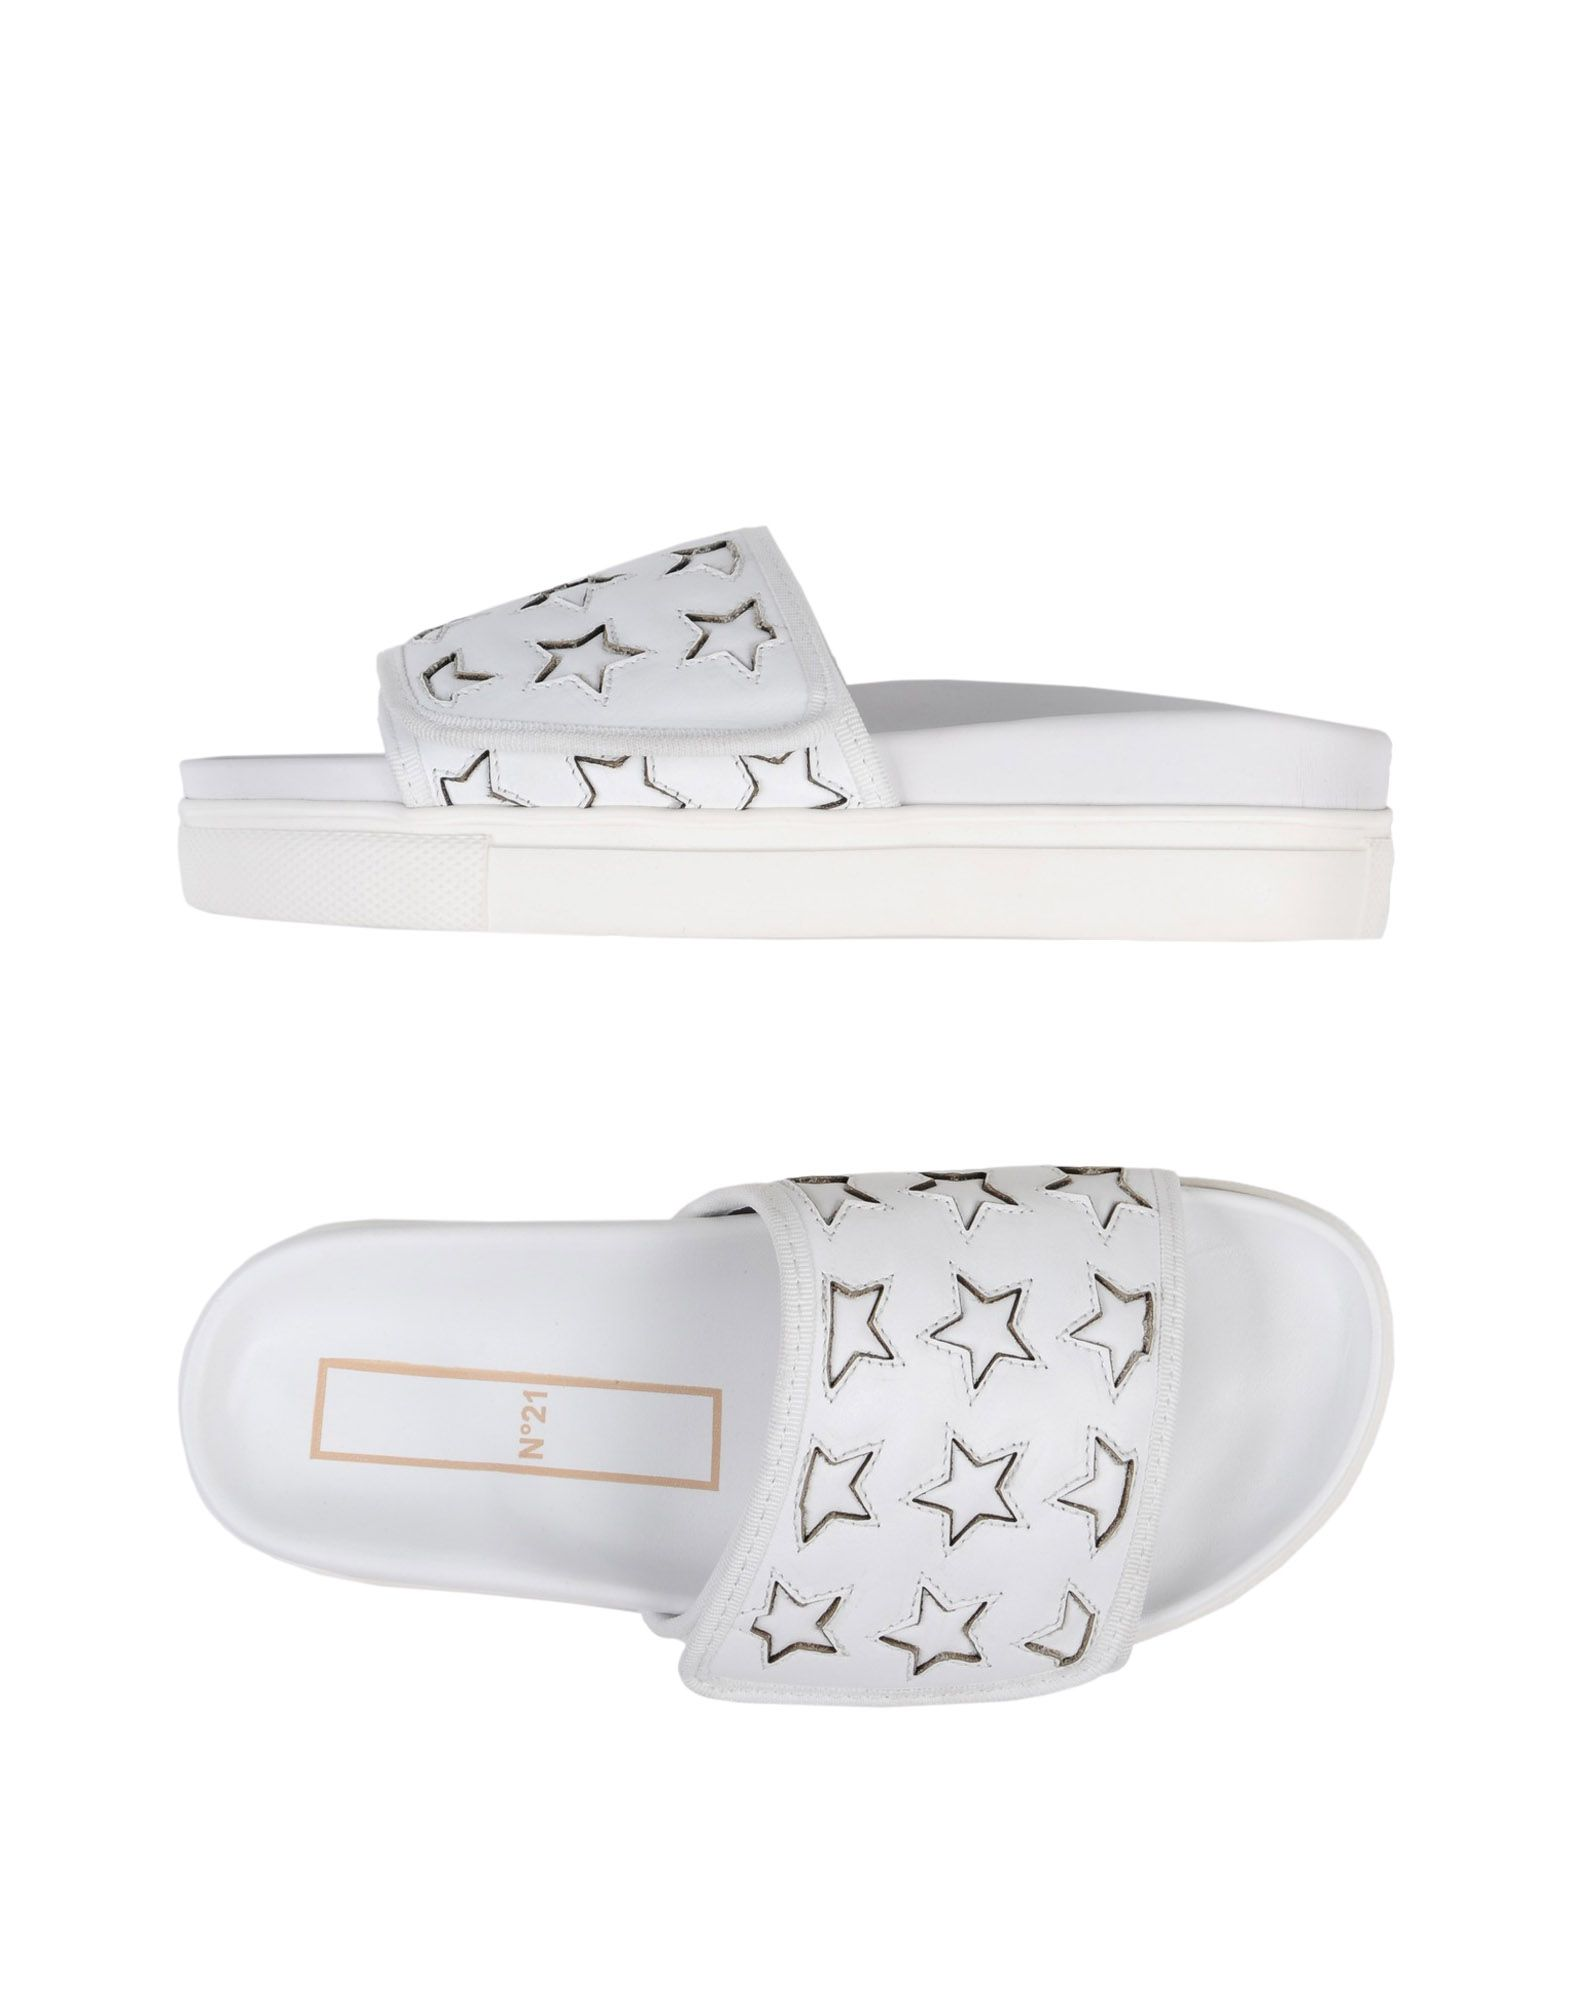 Stilvolle Stilvolle Stilvolle billige Schuhe N° 21 Sandalen Damen  11412983GW 776b53